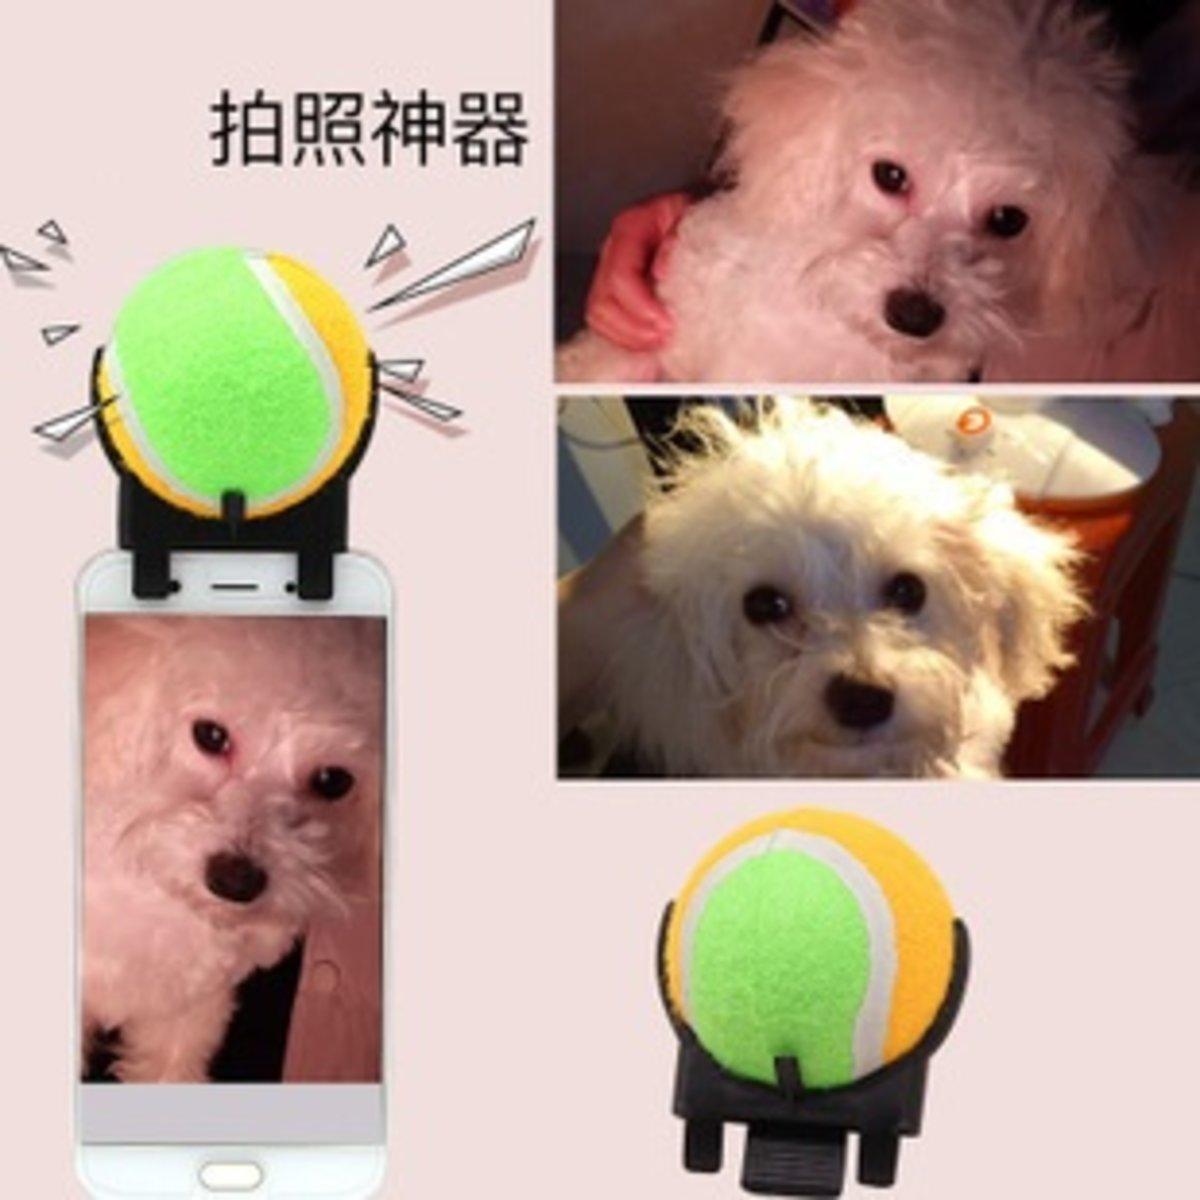 Pet selfie tools with tennis ball